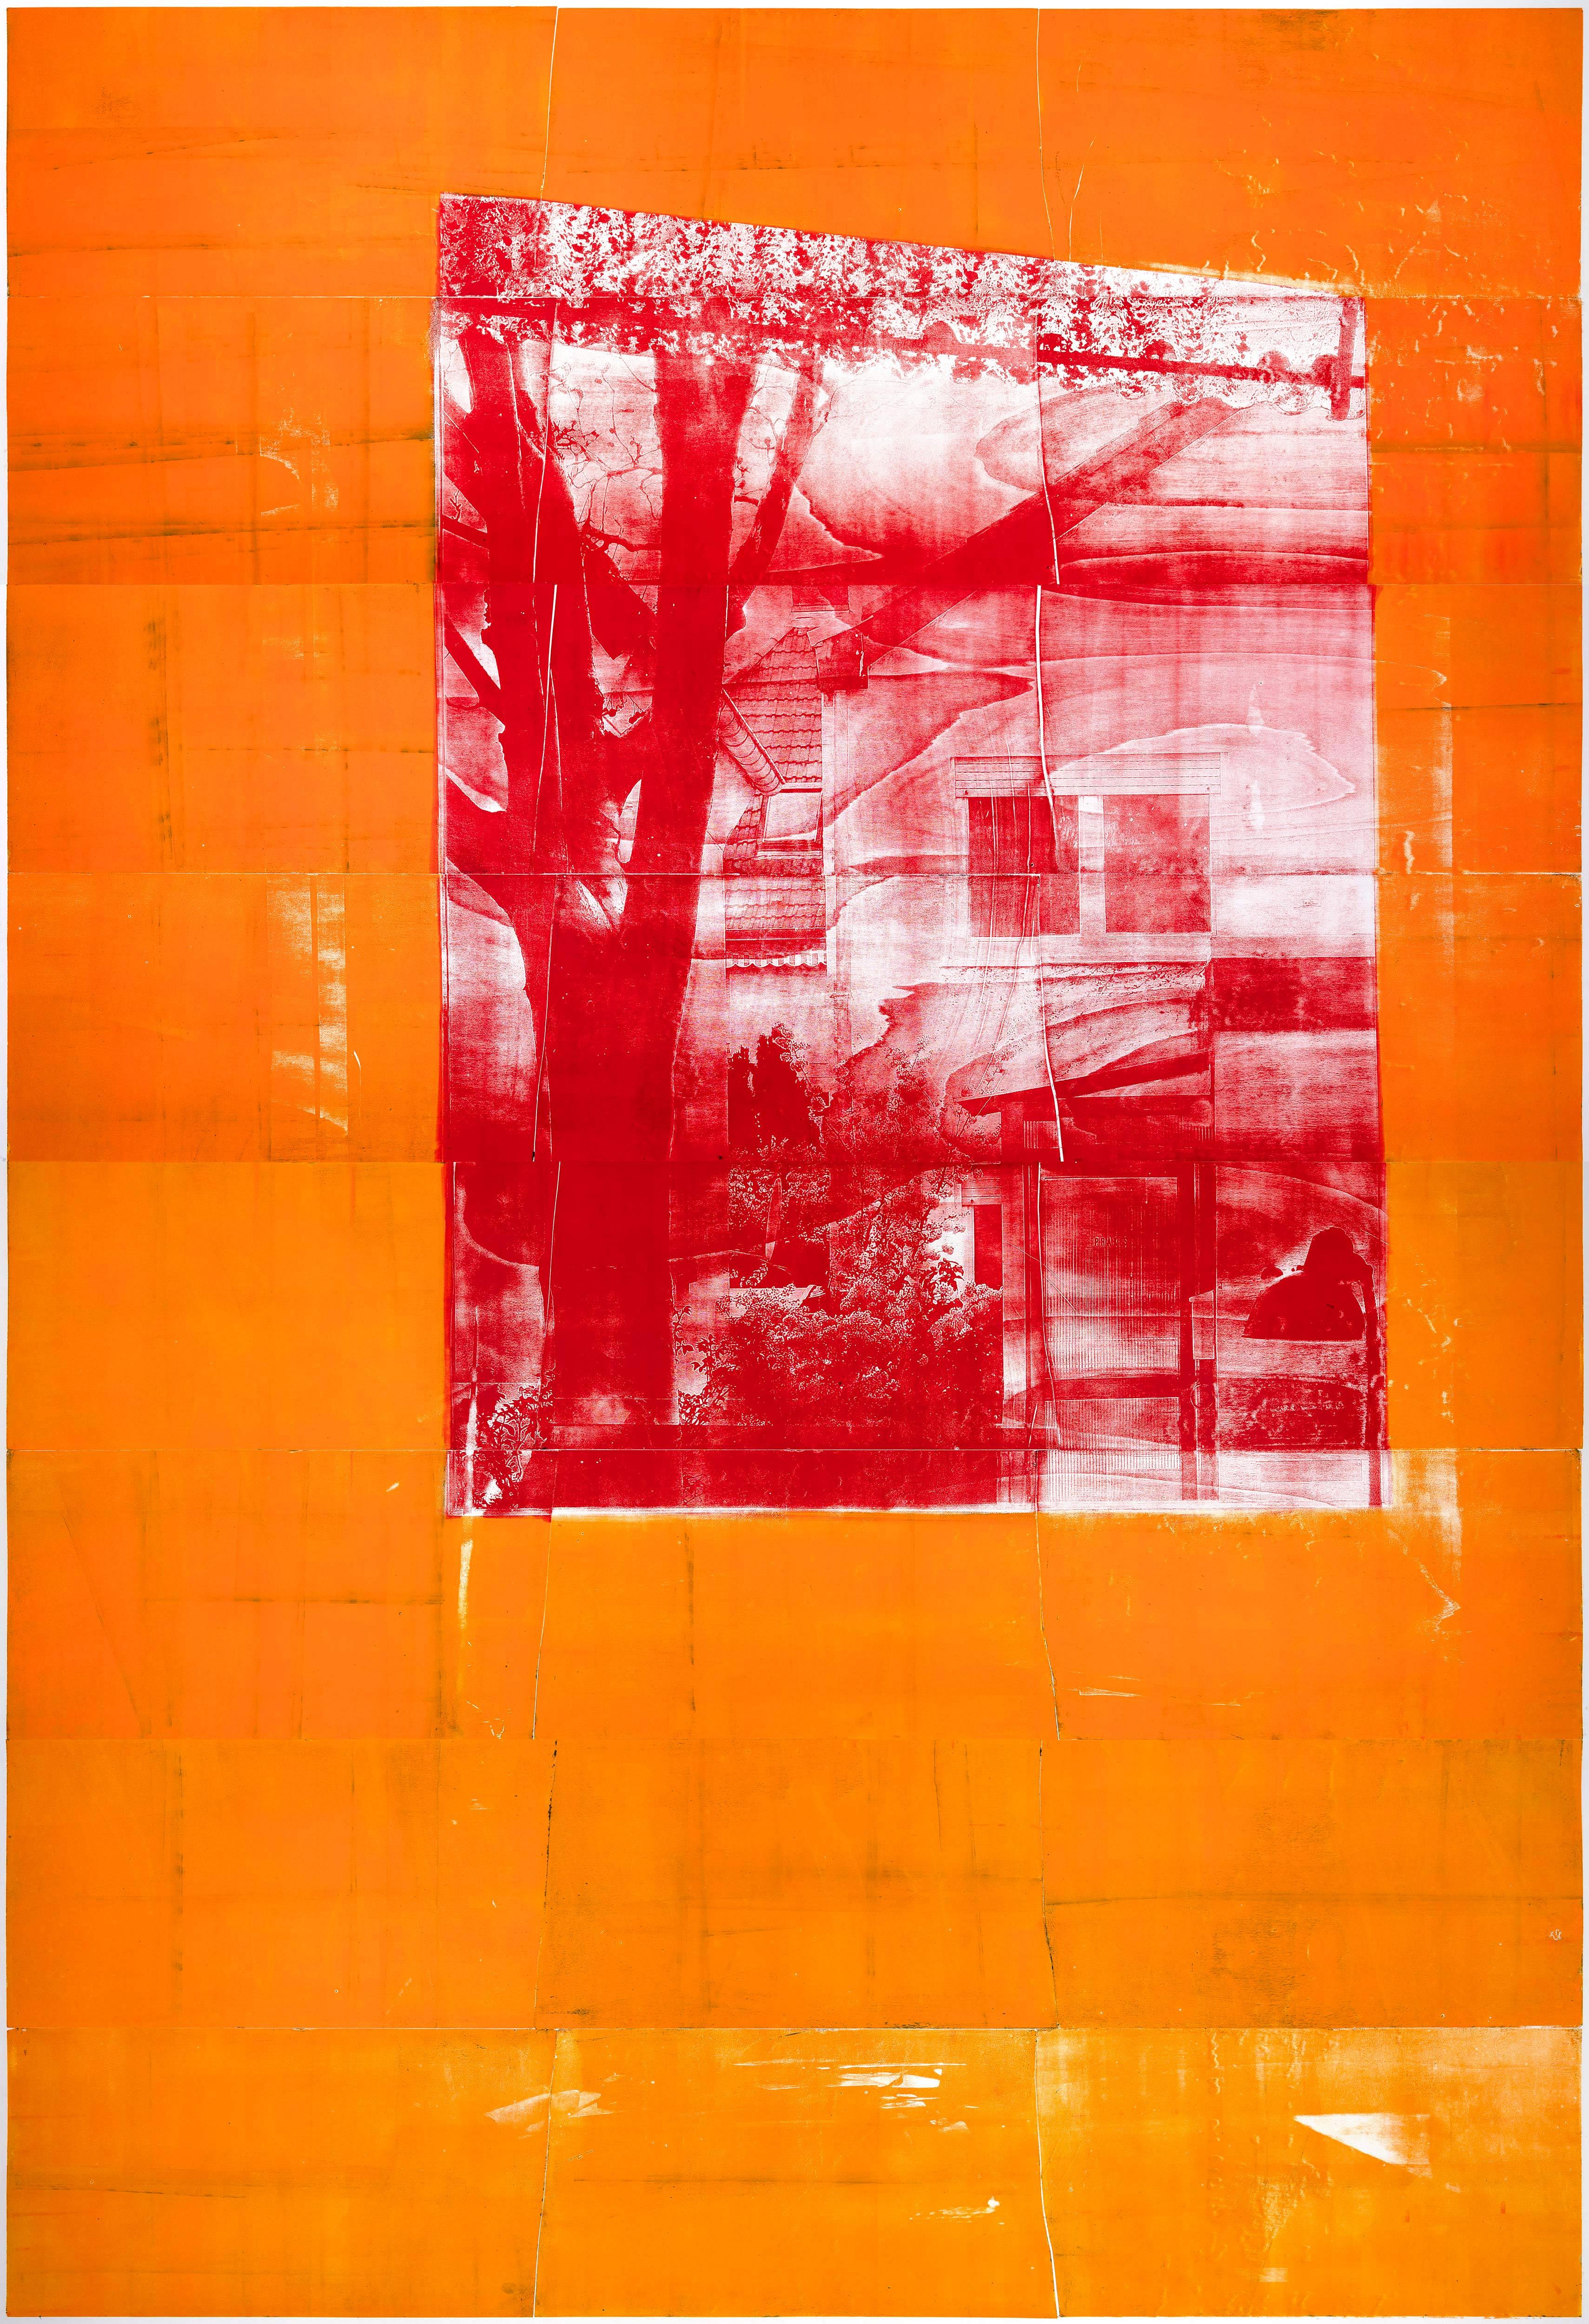 Fenster (Abend), 2019, wood engraving, 382,9 x 272,5 cm, Genaro Strobel